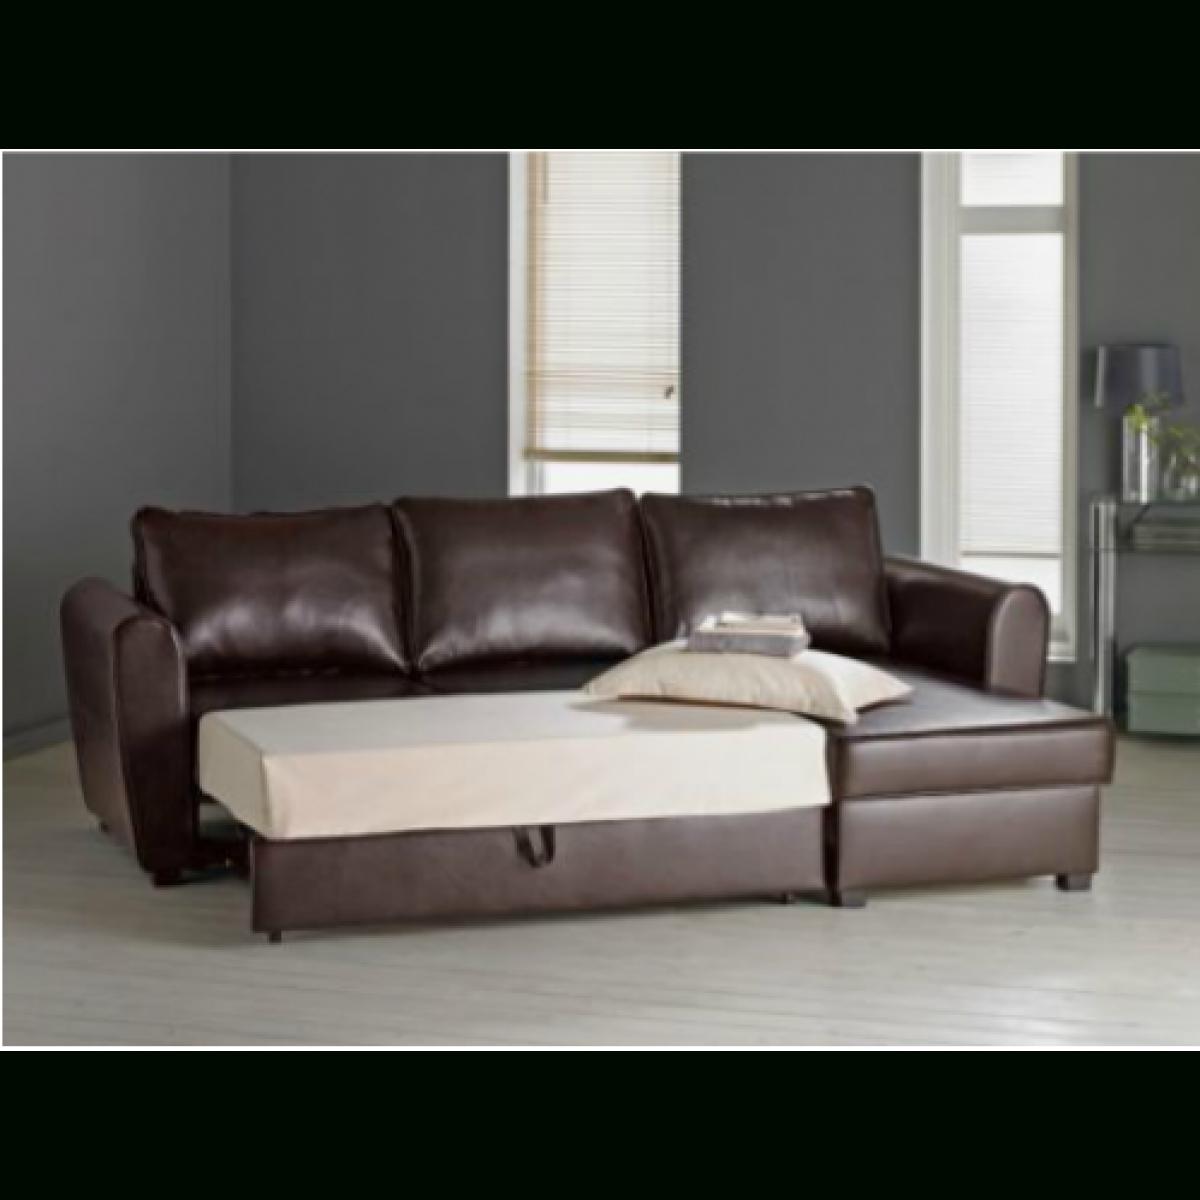 New Siena Fabric Corner Sofa Bed With Storage – Charcoal Intended For Fabric Corner Sofa Bed (Image 13 of 20)